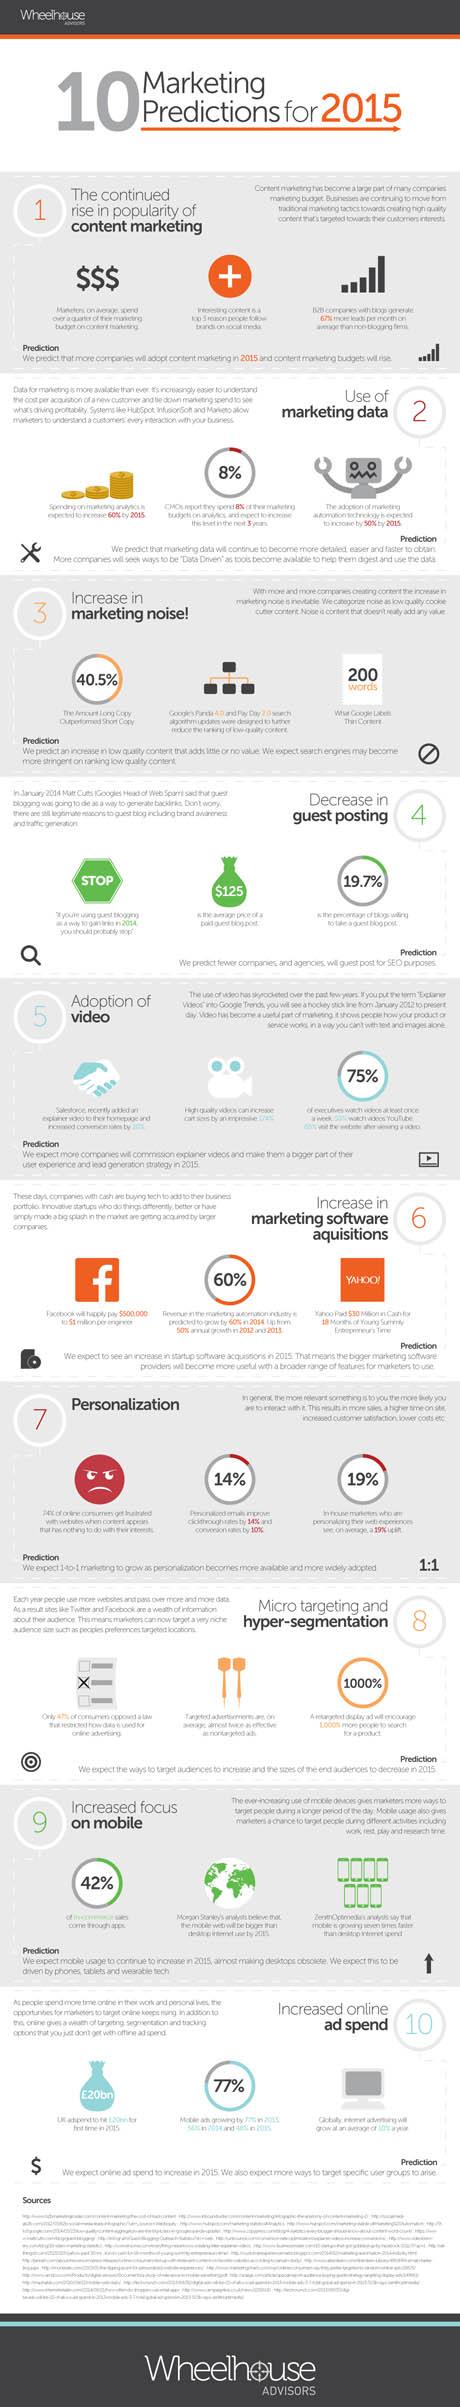 10-marketing-predictions-2015-small